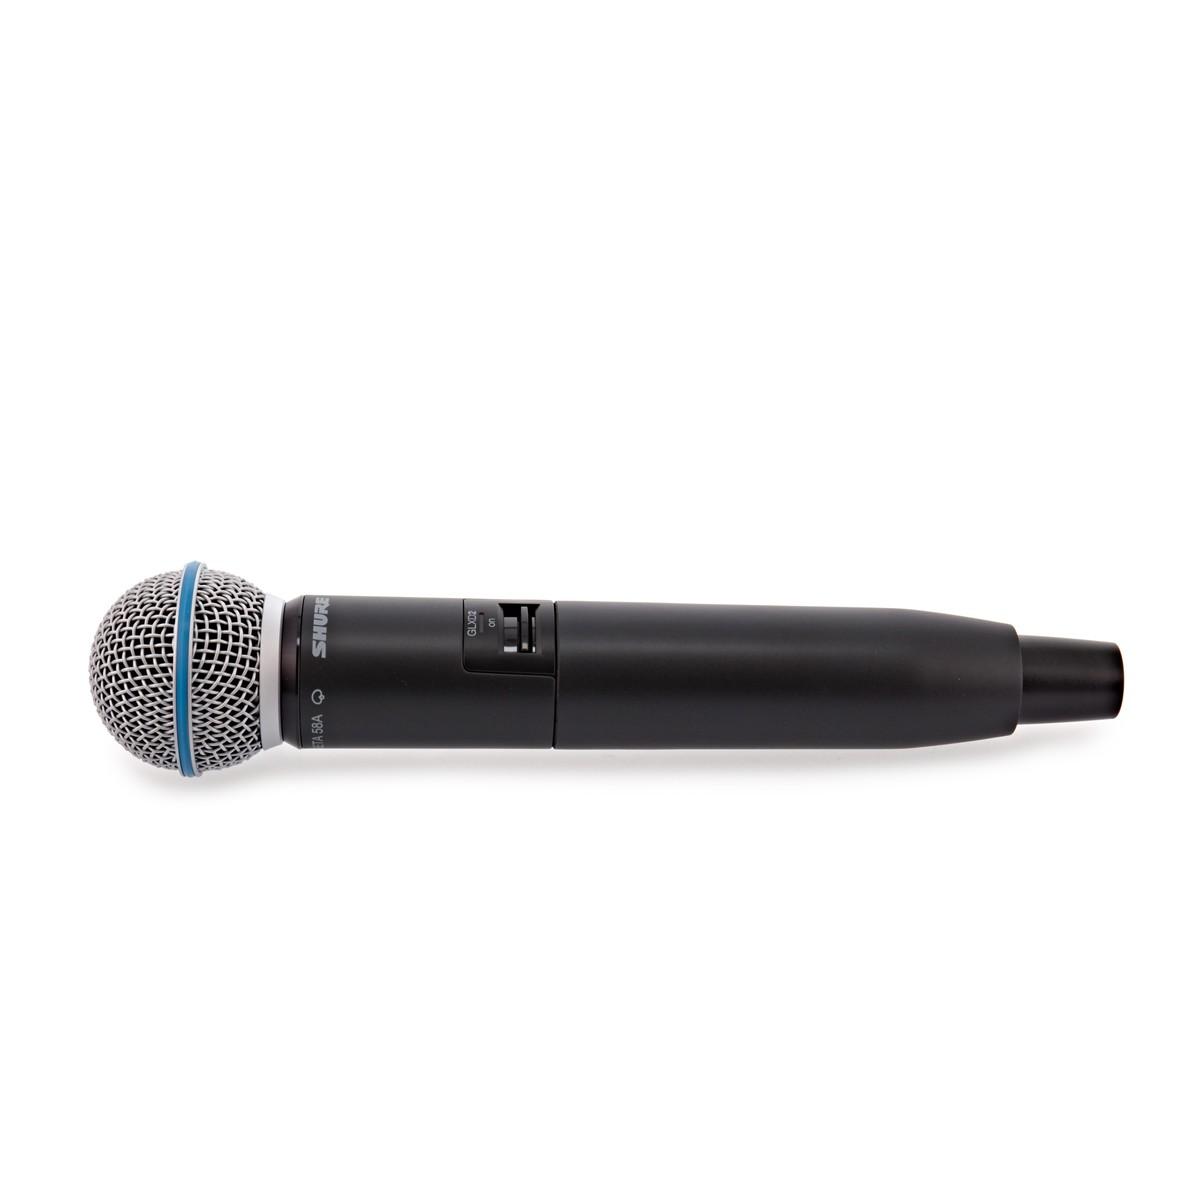 Shure GLXD24 vokal system med Beta58 Trådløse mikrofoner